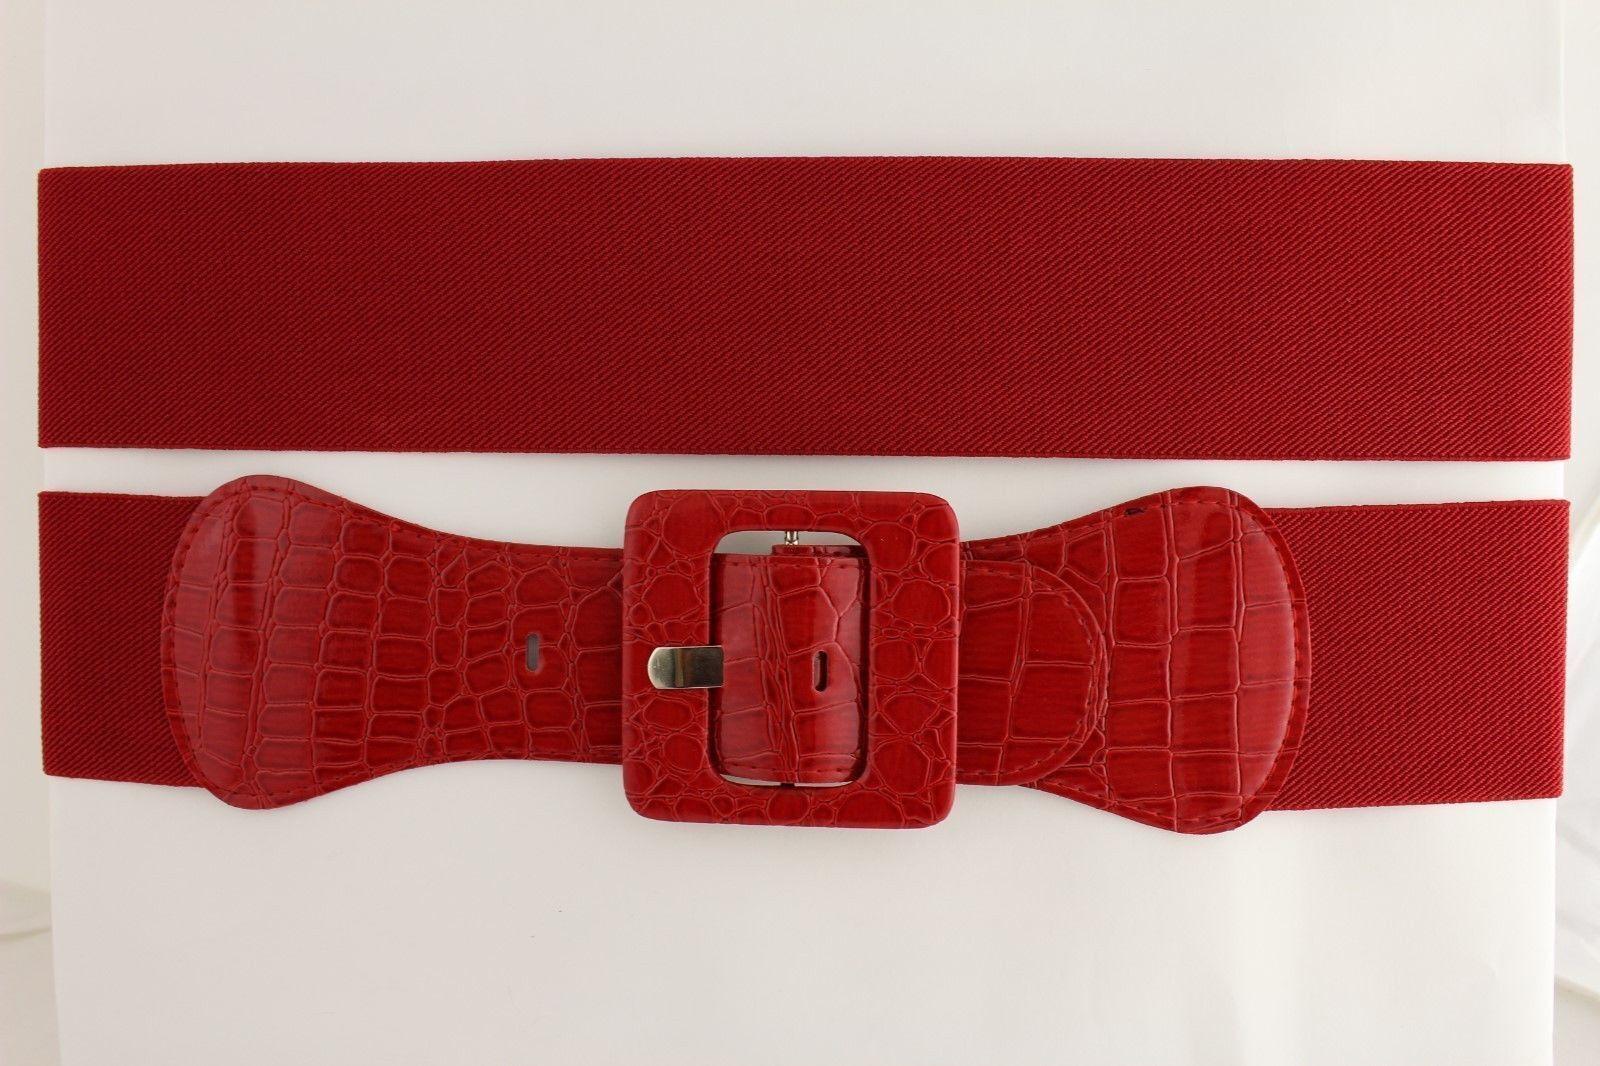 Sexy Women Hip High Waist Elastic Waistband Belt Casual Fashion Look Red M L XL